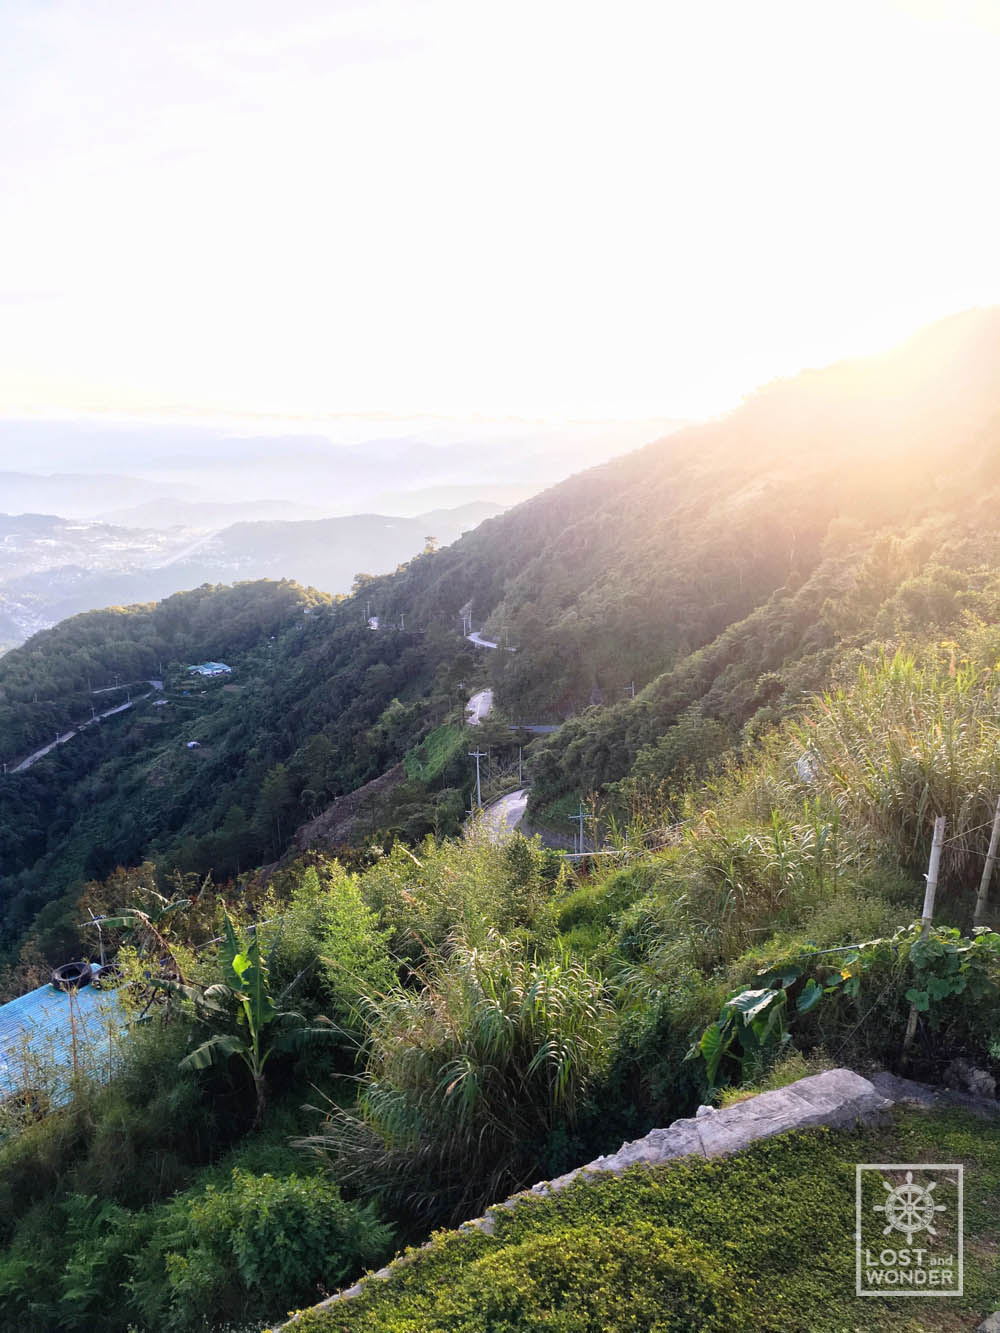 Photo of Mt. Sto. Tomas Cabuyo road in Baguio City